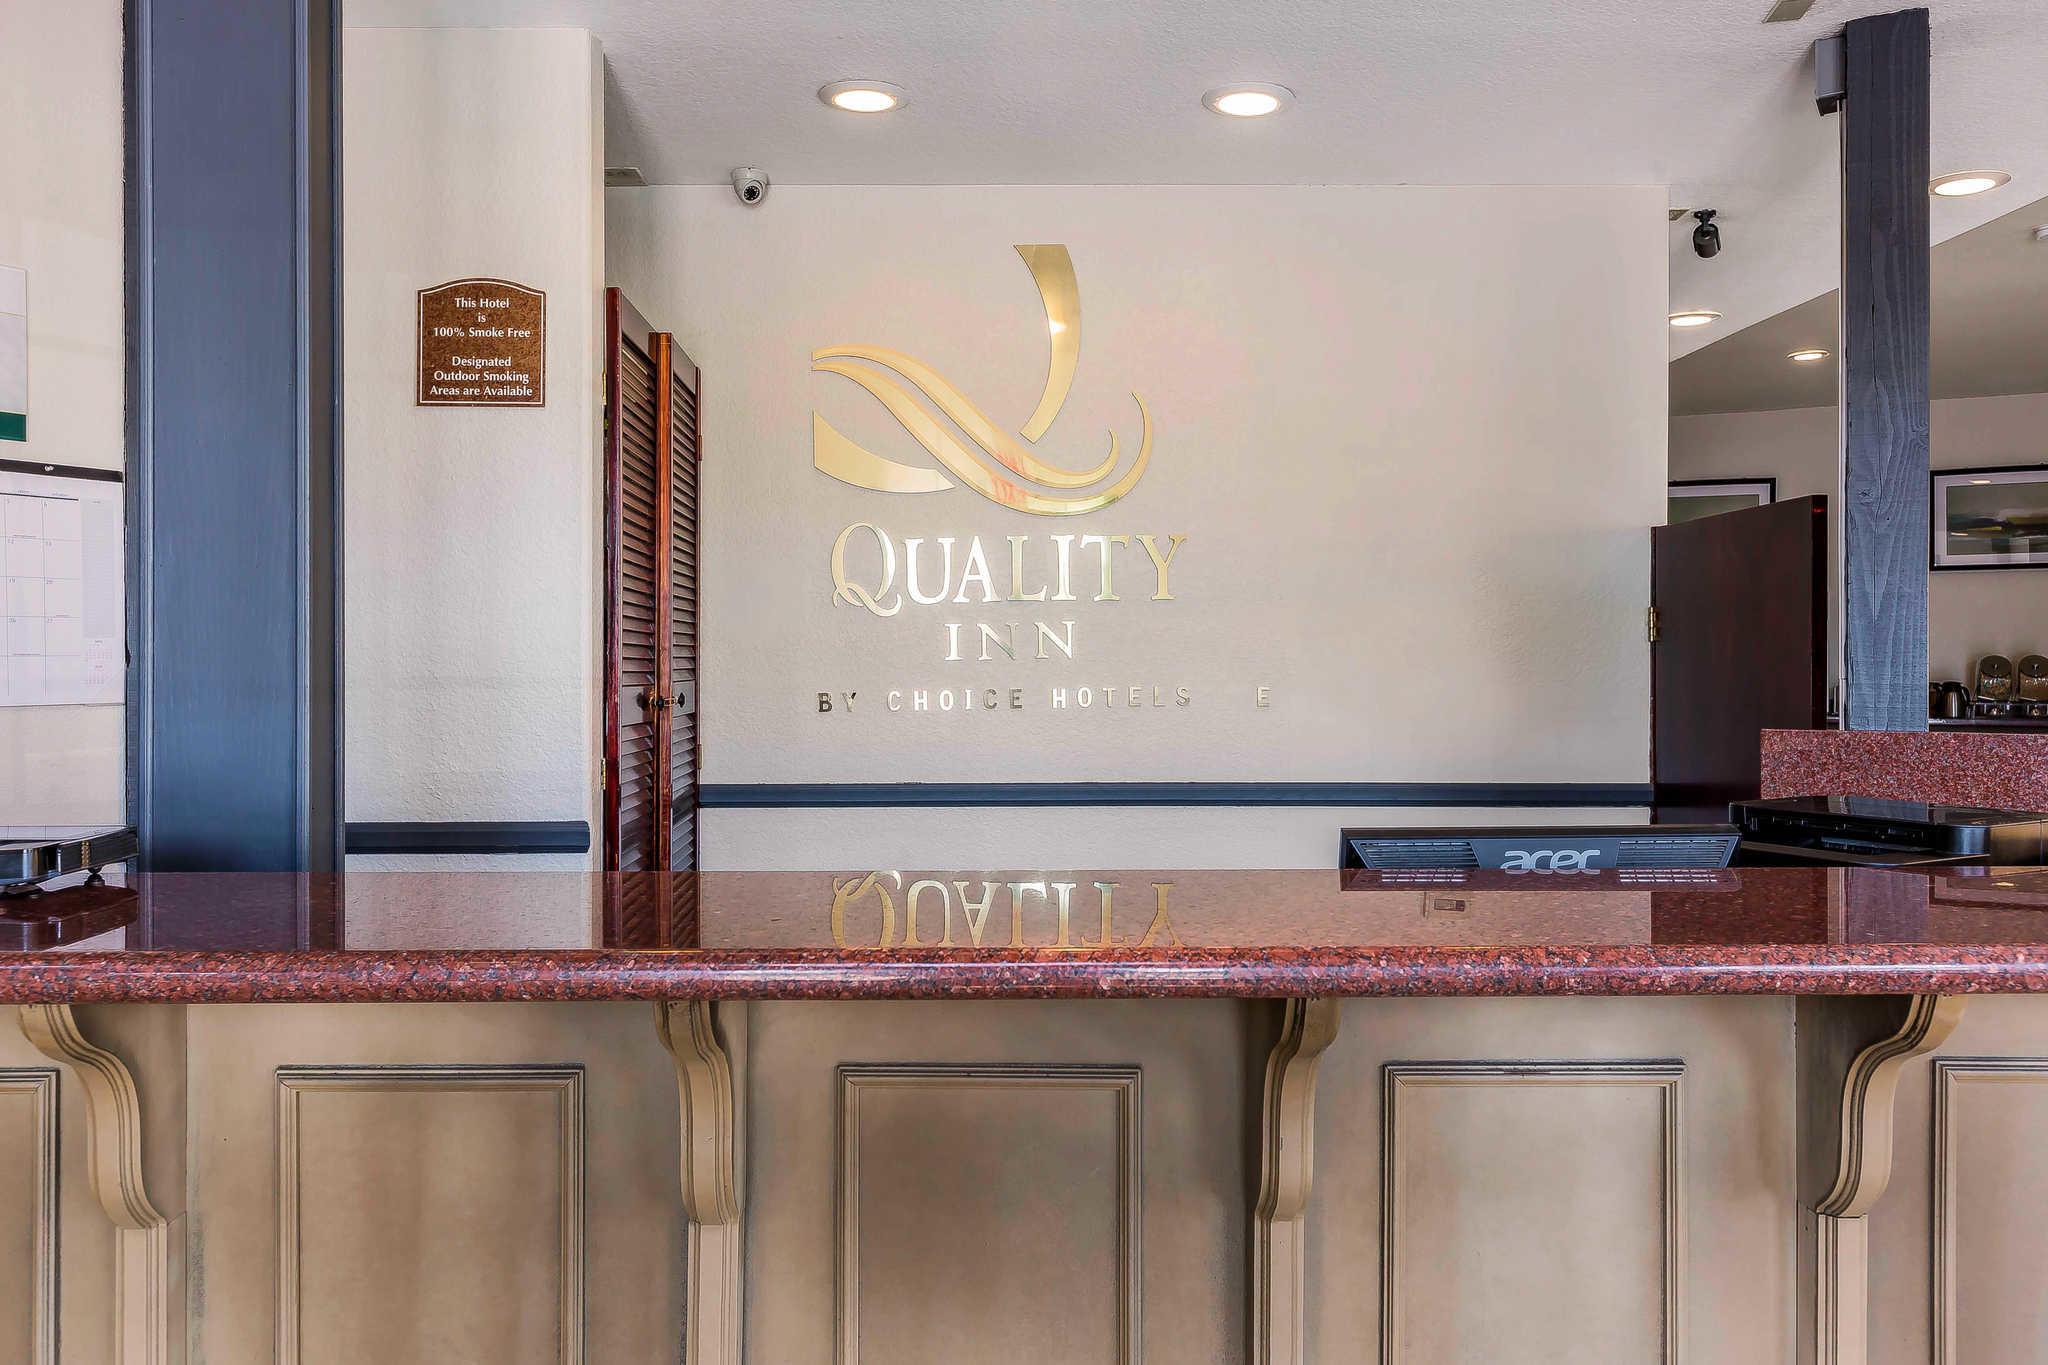 Quality Inn Fallbrook I-15 image 3